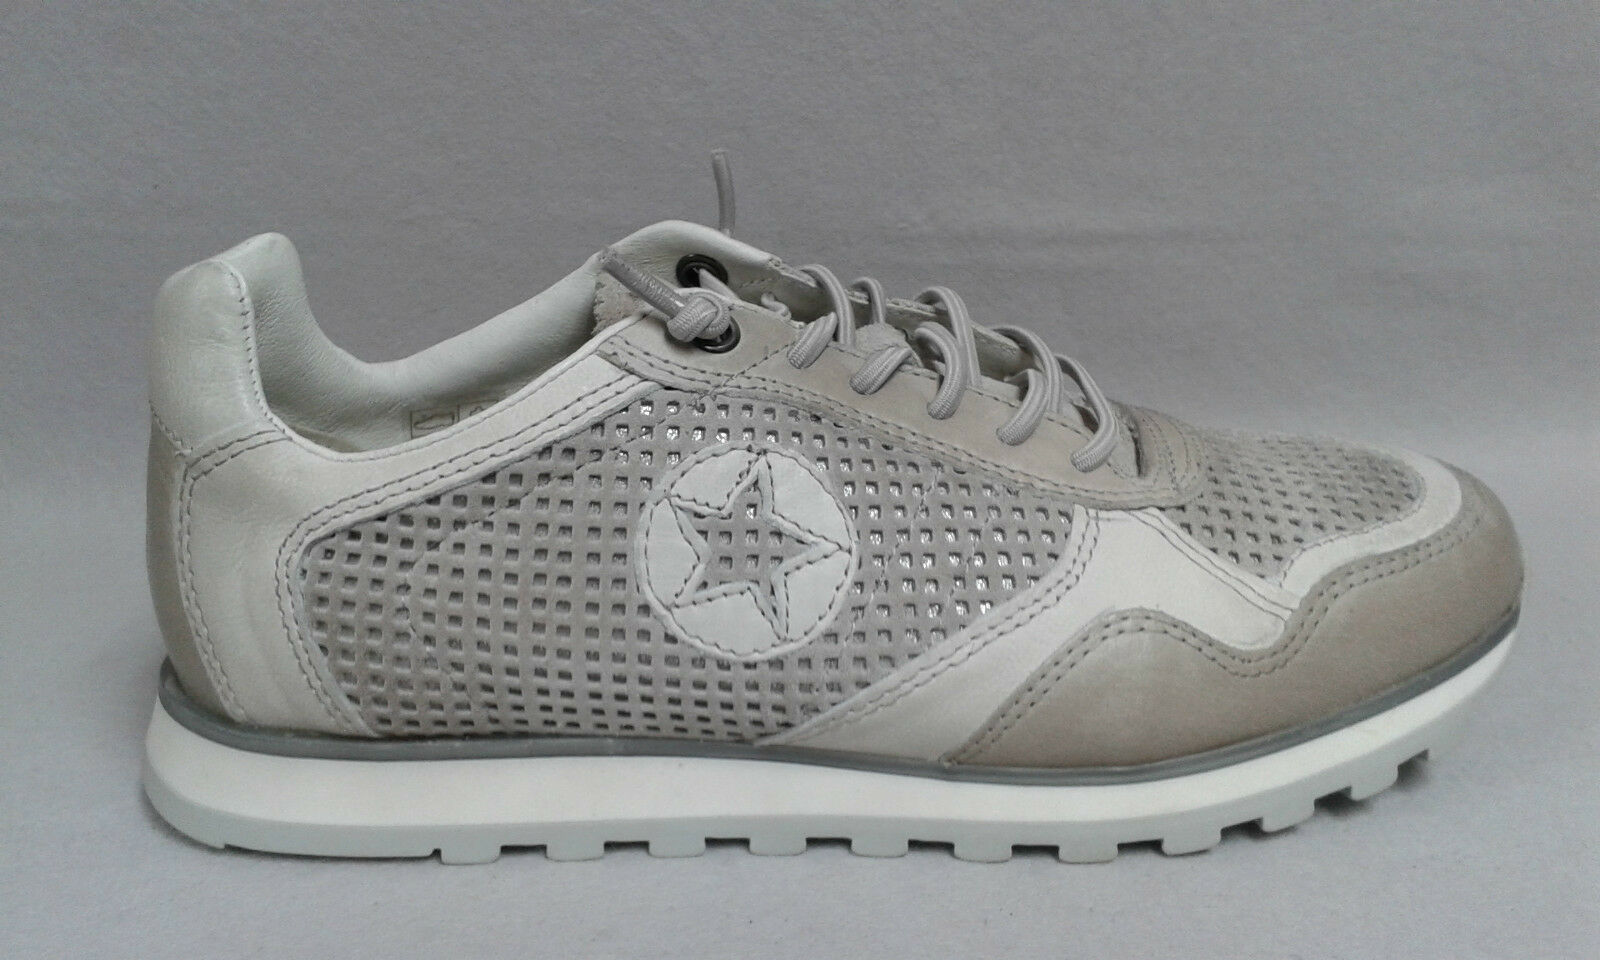 Minu Sneaker Halbschuh grau Echtleder Gummisenkel beqeuem Lederdecksohle 207464